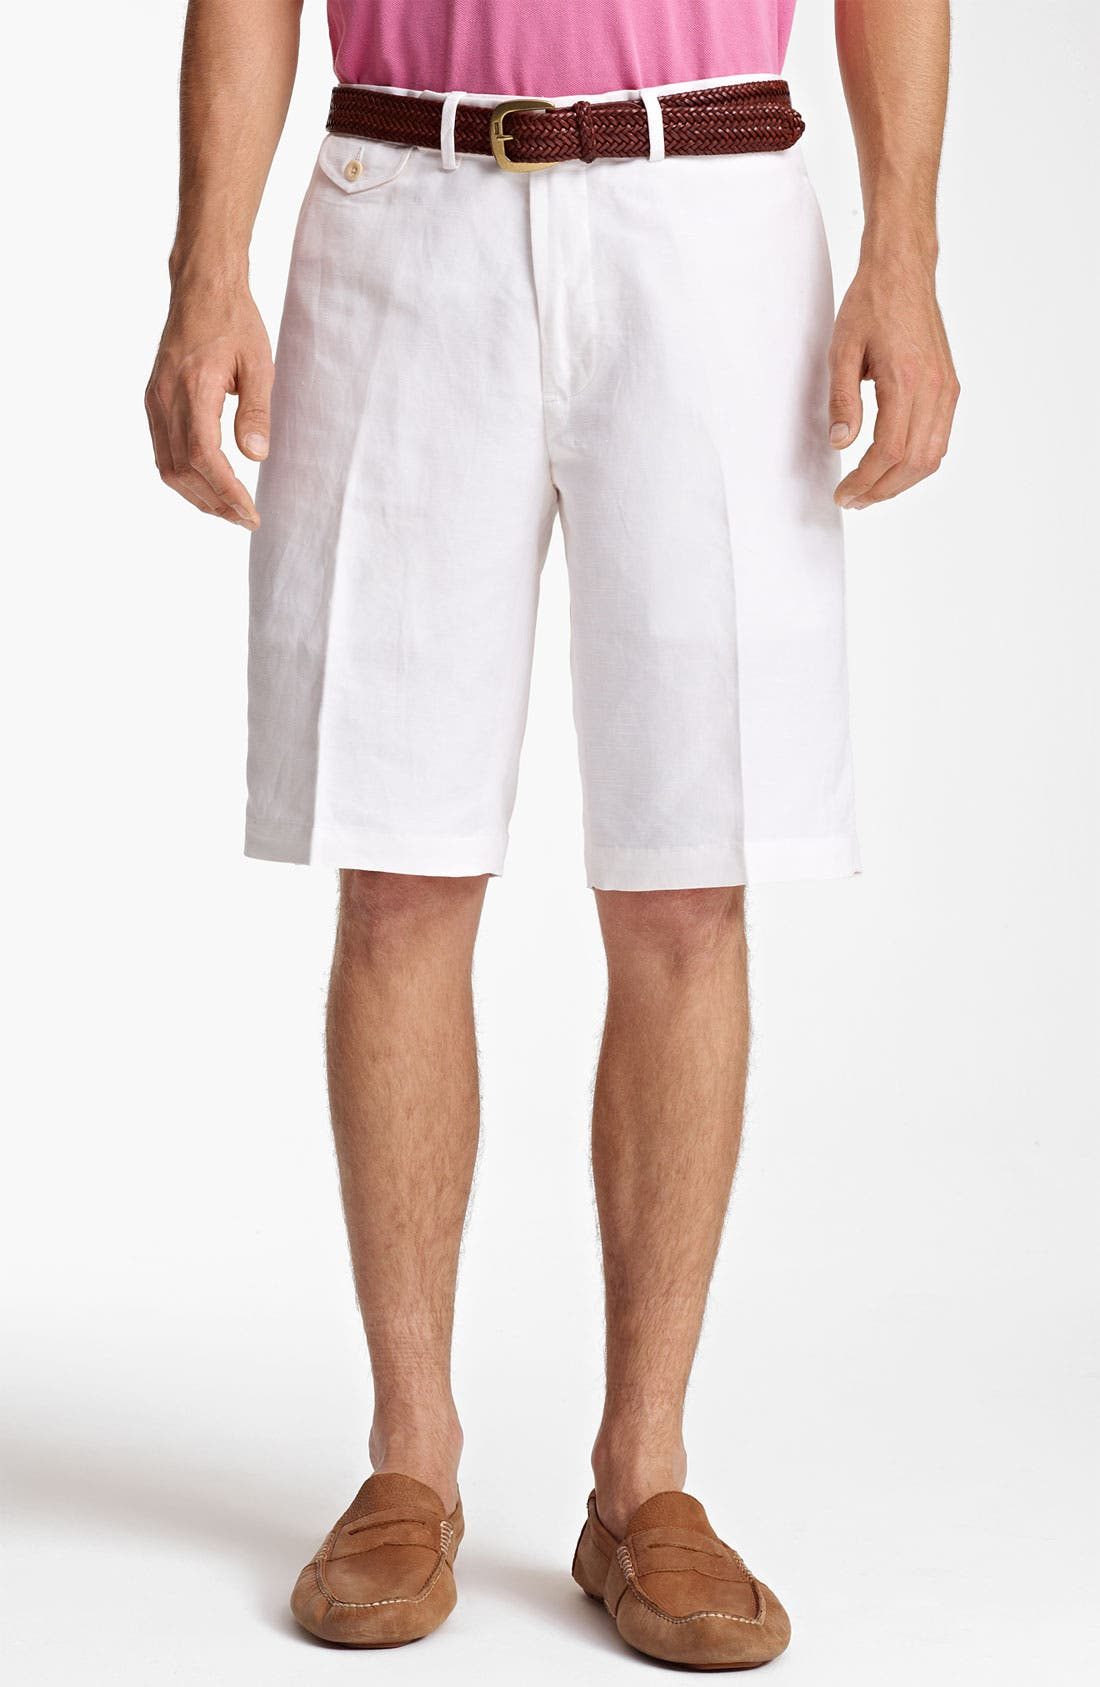 Alternate Image 1 Selected - Polo Ralph Lauren Flat Front Linen Blend Shorts